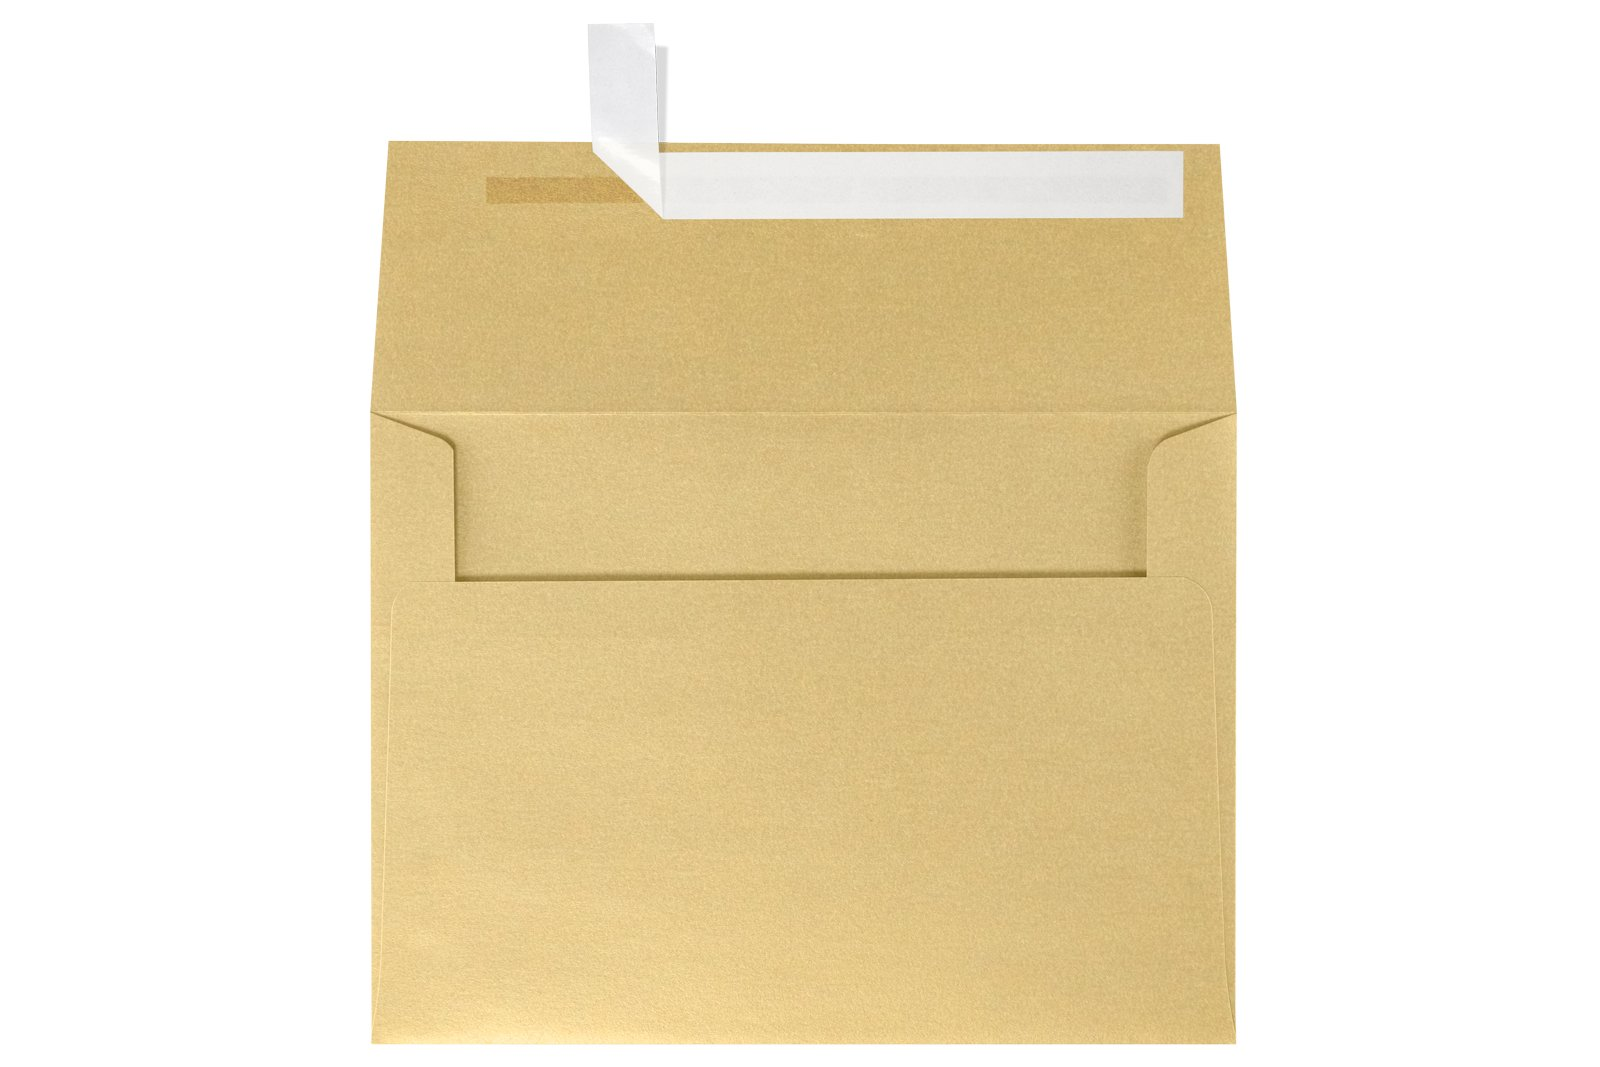 A7 Invitation Envelopes (5.25 x 7.25) - Blonde Light Gold Metallic (50 Qty.)   Fits 5 x 7 Photos  